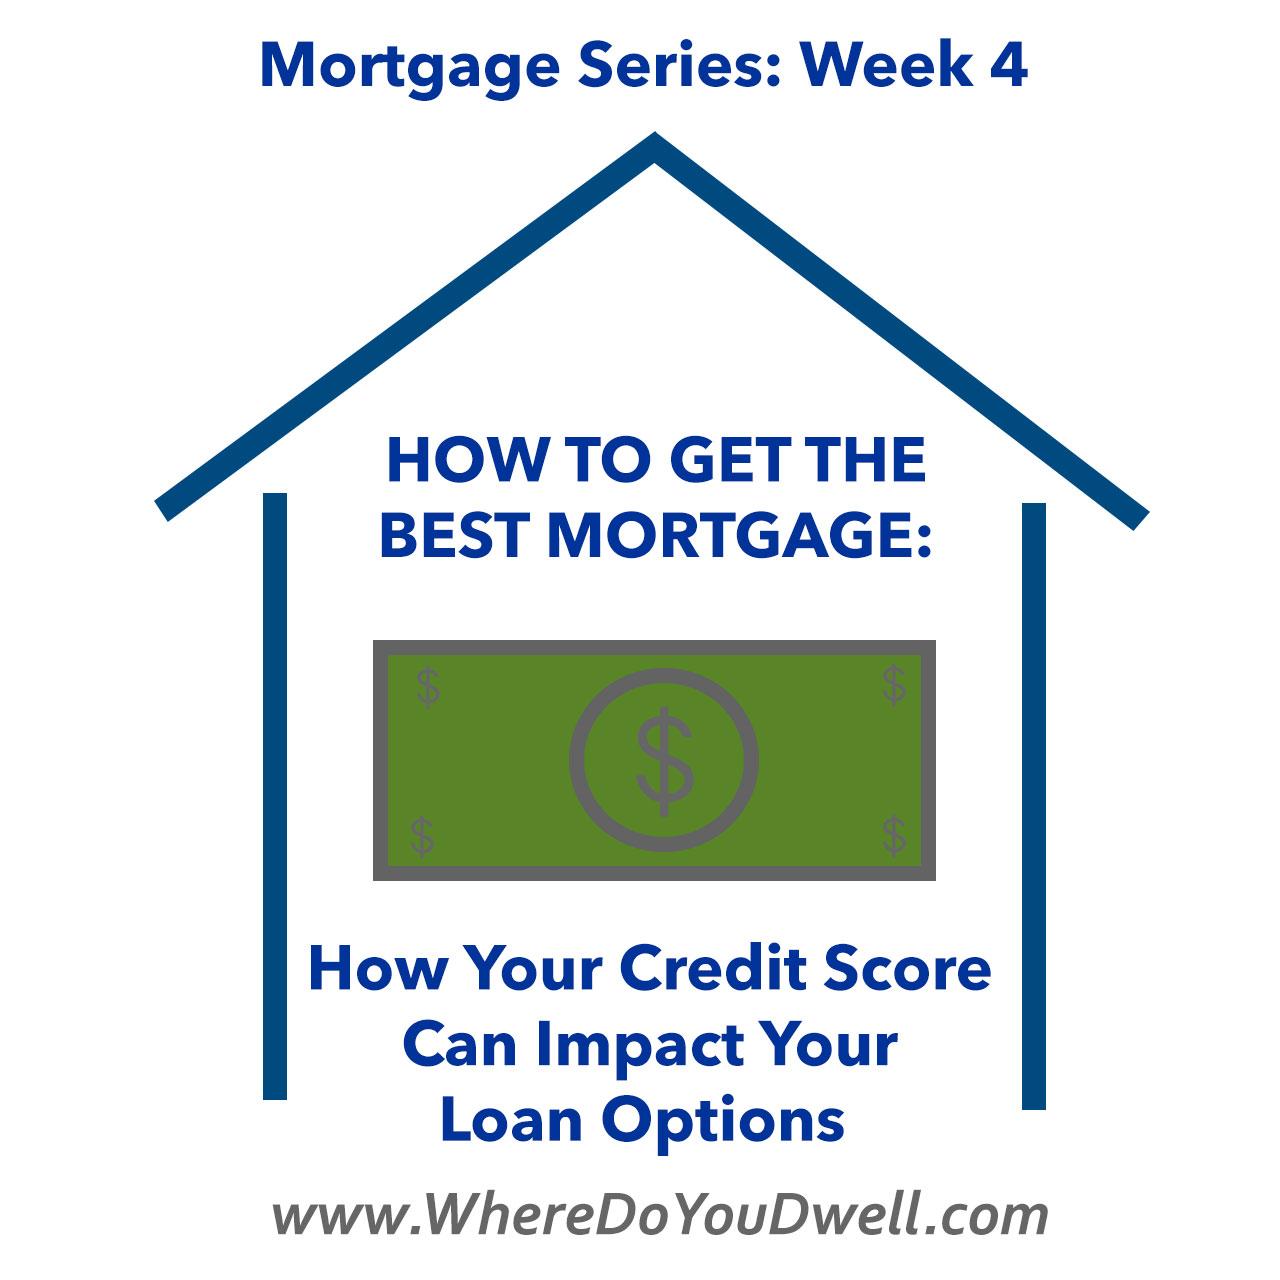 mortgageSeriesWeek4